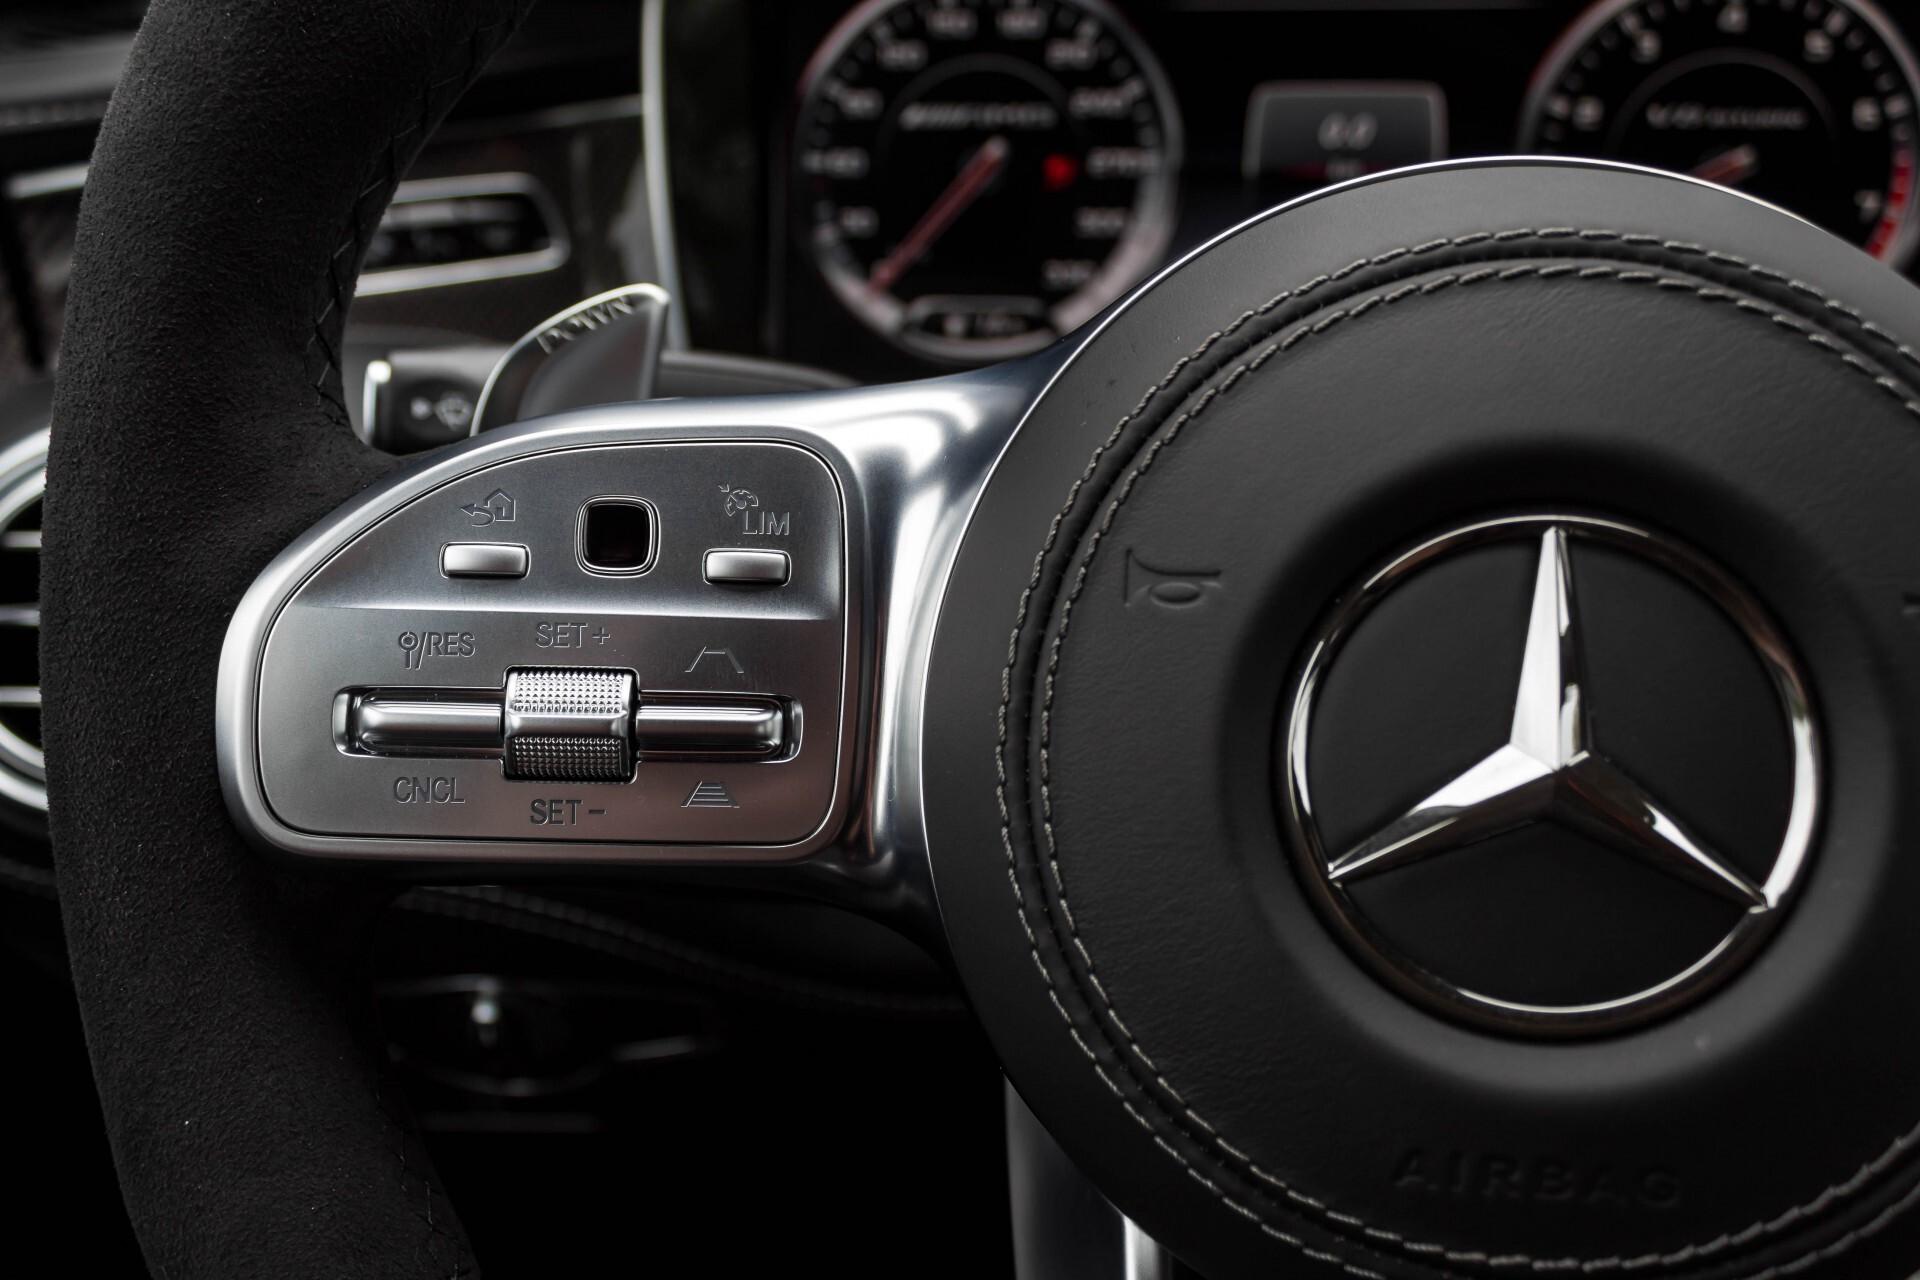 Mercedes-Benz S-Klasse Cabrio 63 AMG 4-M Ceramic/Designo/Carbon/Burmester High End Aut Foto 12